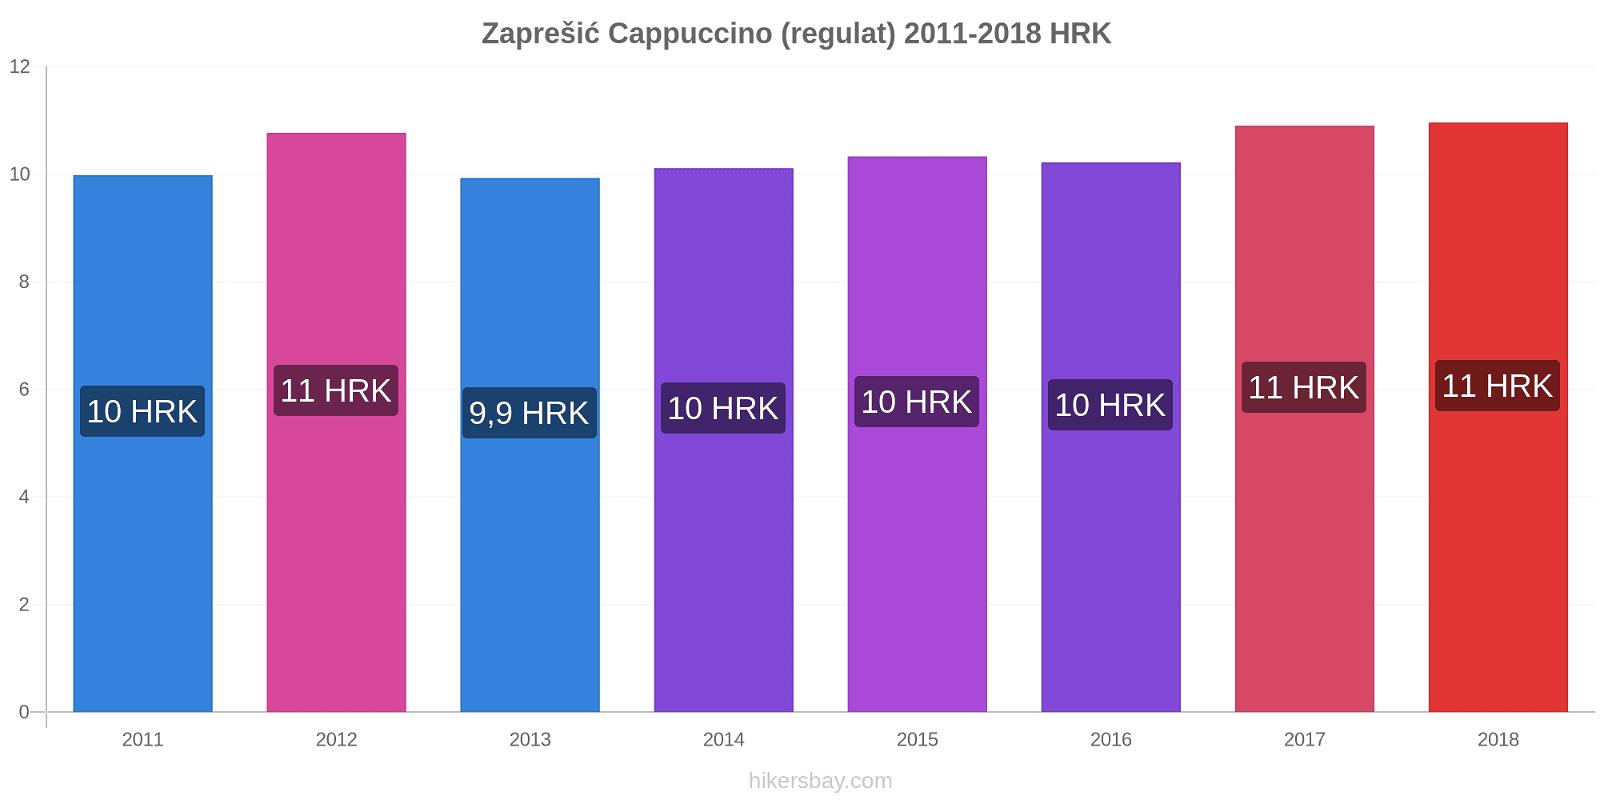 Zaprešić modificări de preț Cappuccino (regulat) hikersbay.com